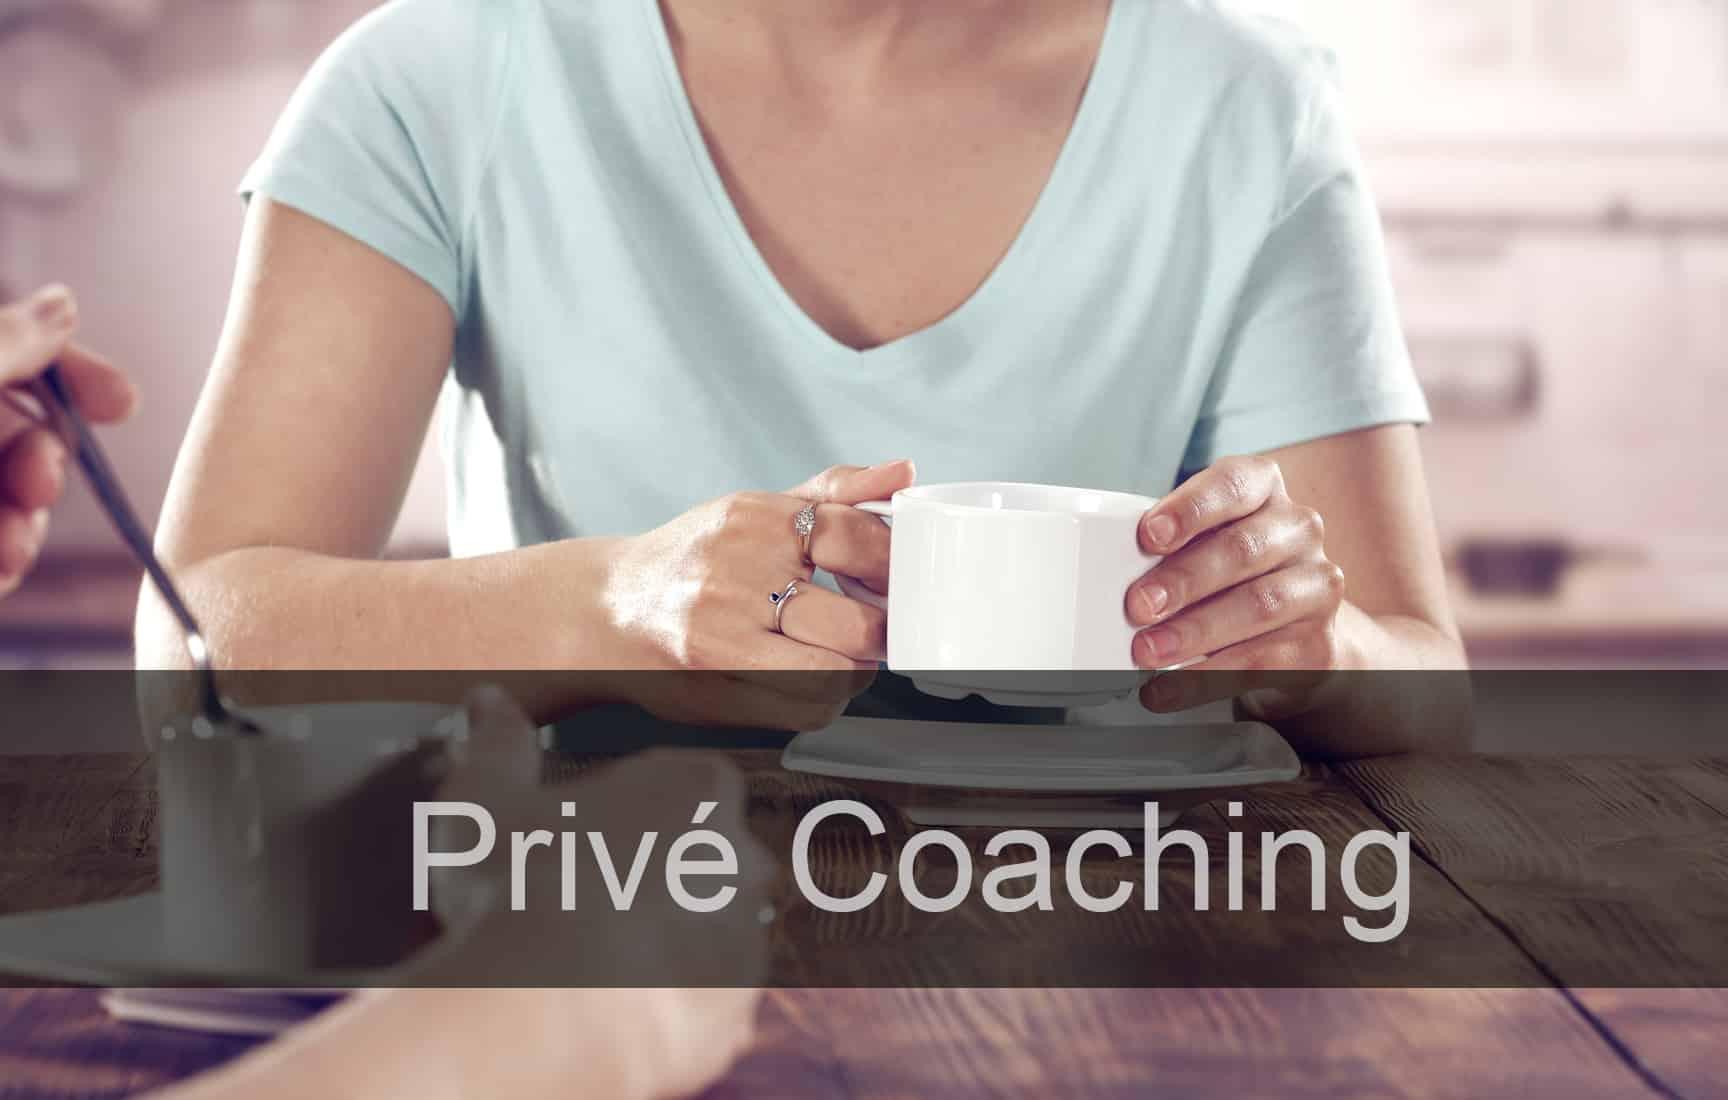 7qi Coaching Amsterdam prive